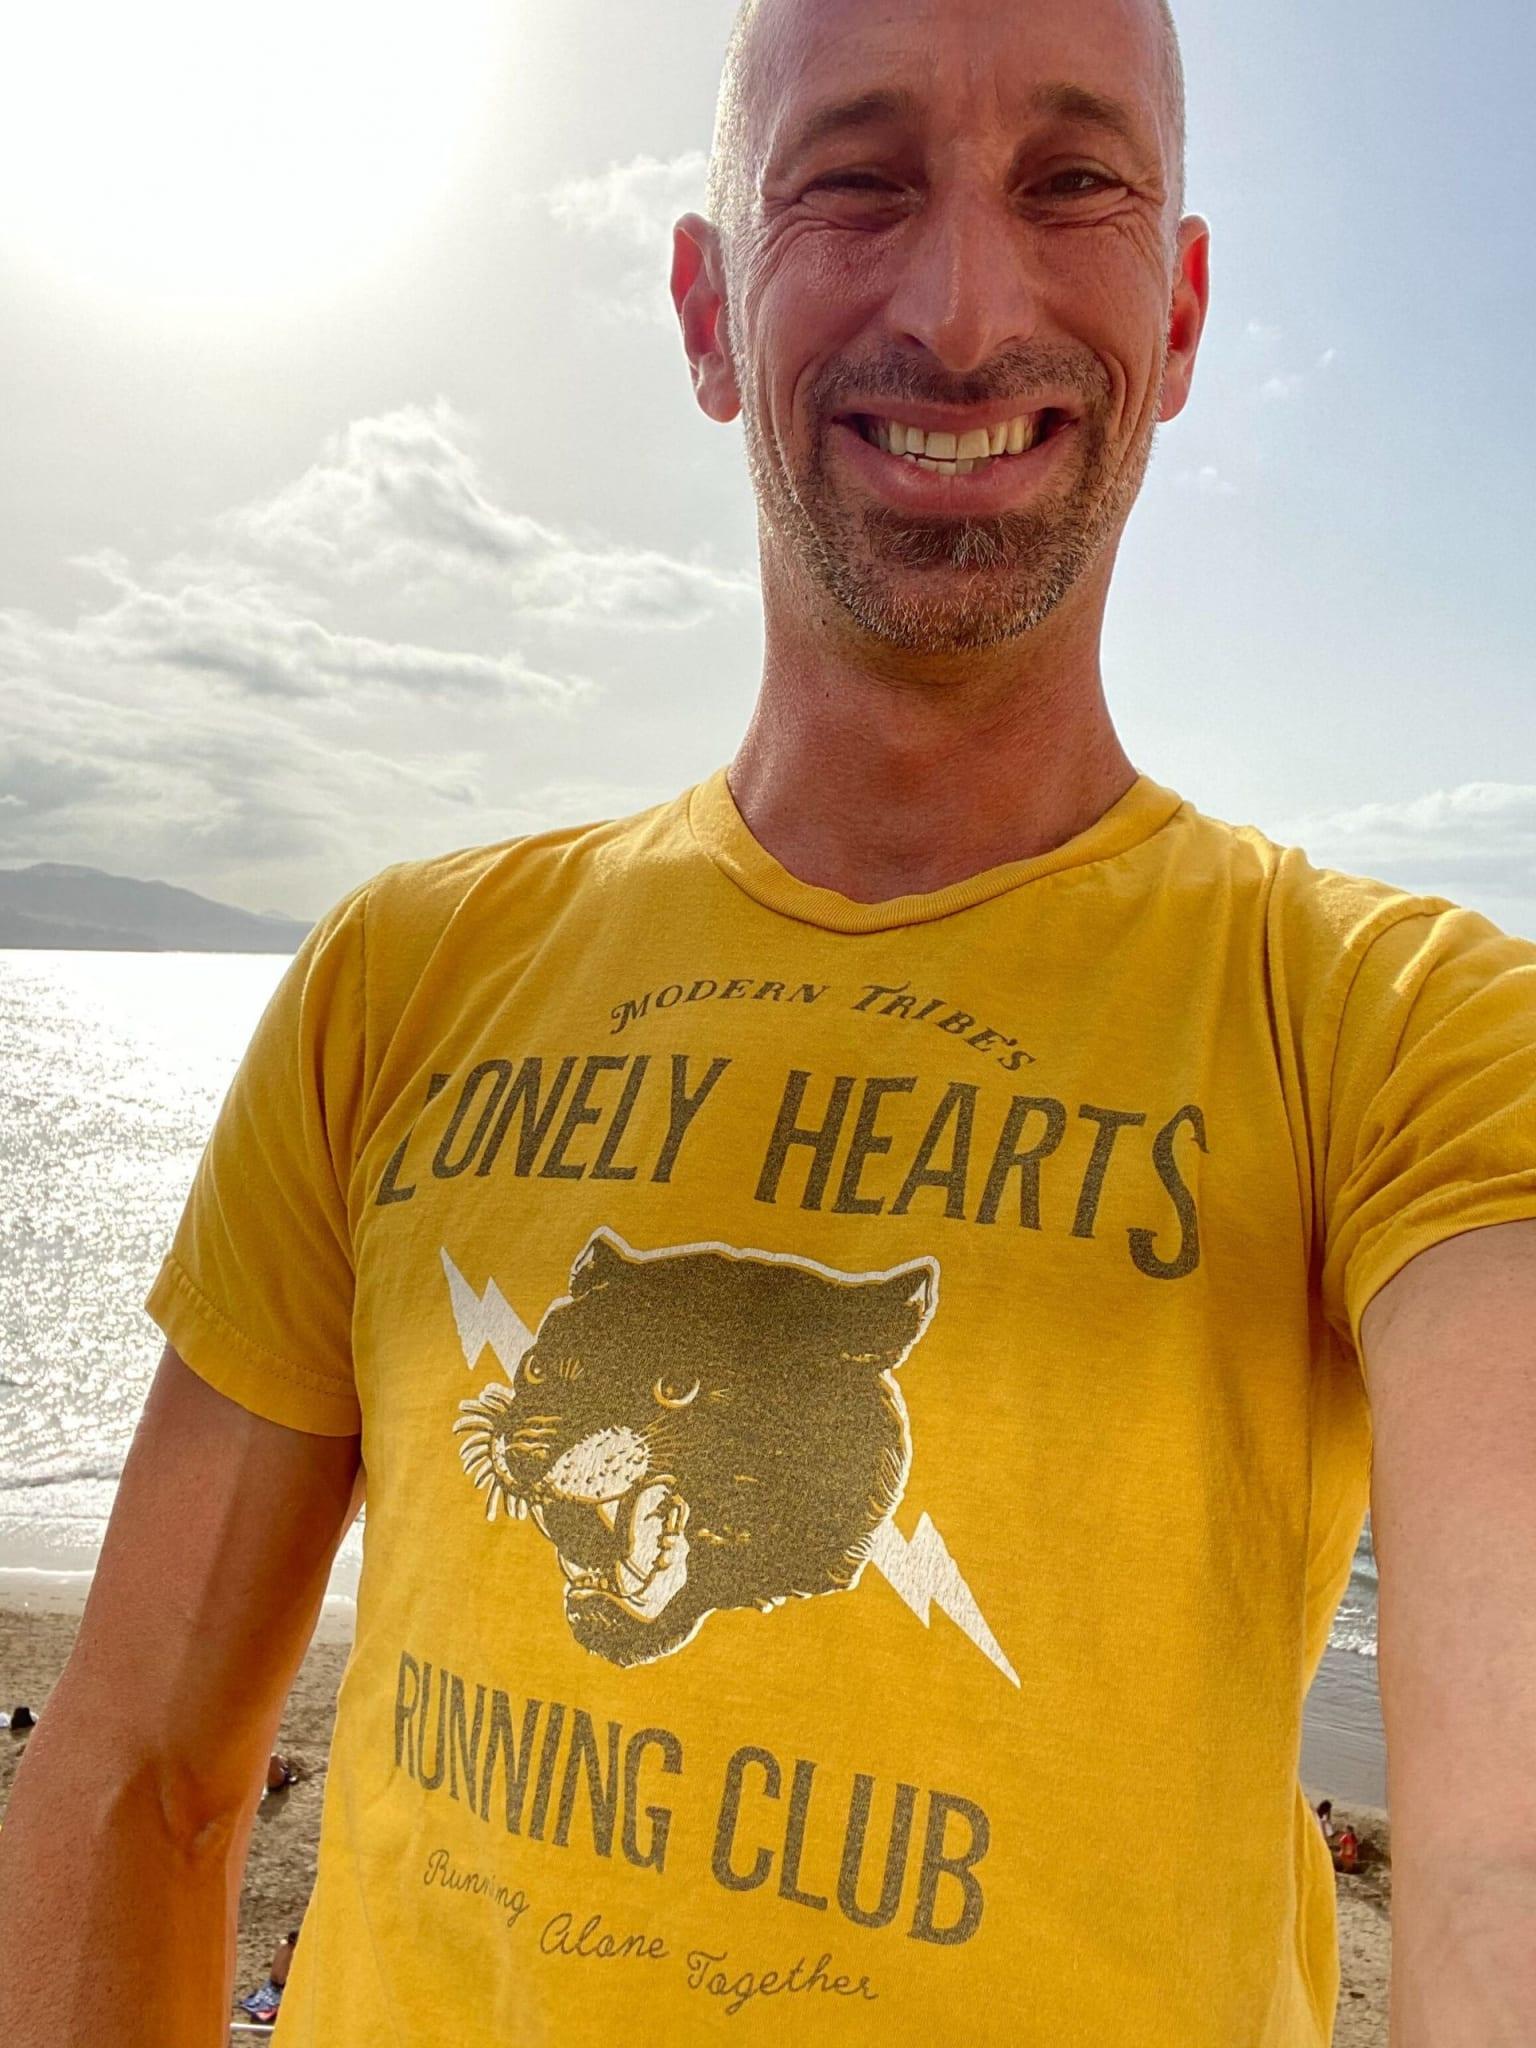 shane-in-running-club-shirt